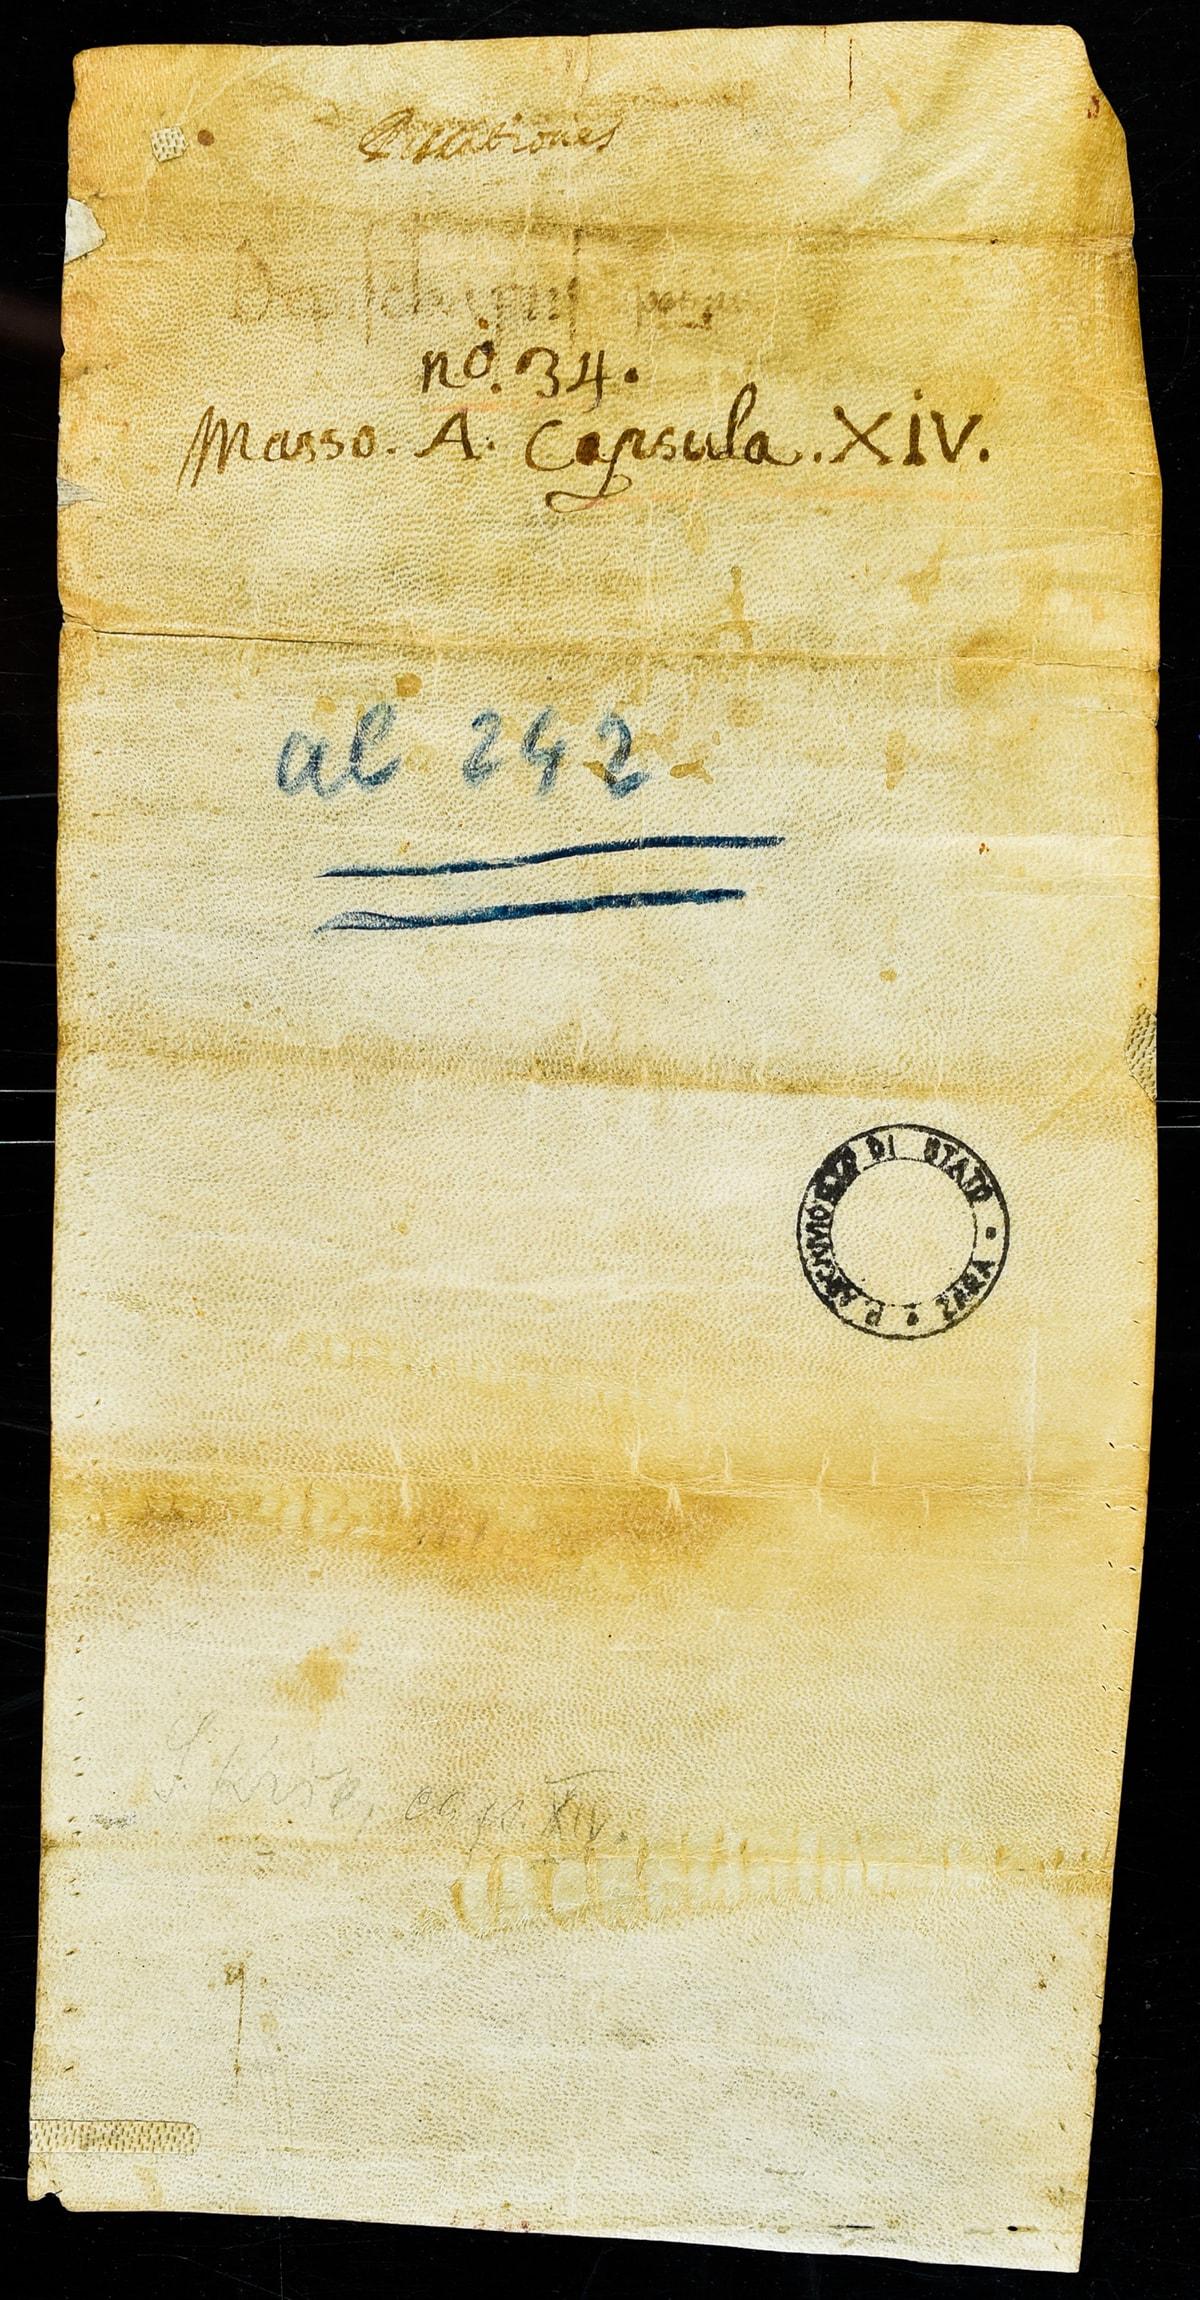 pergamena br 2 dokument o prvom spomenu ribarstva u Hrvata iz 995. godine. v